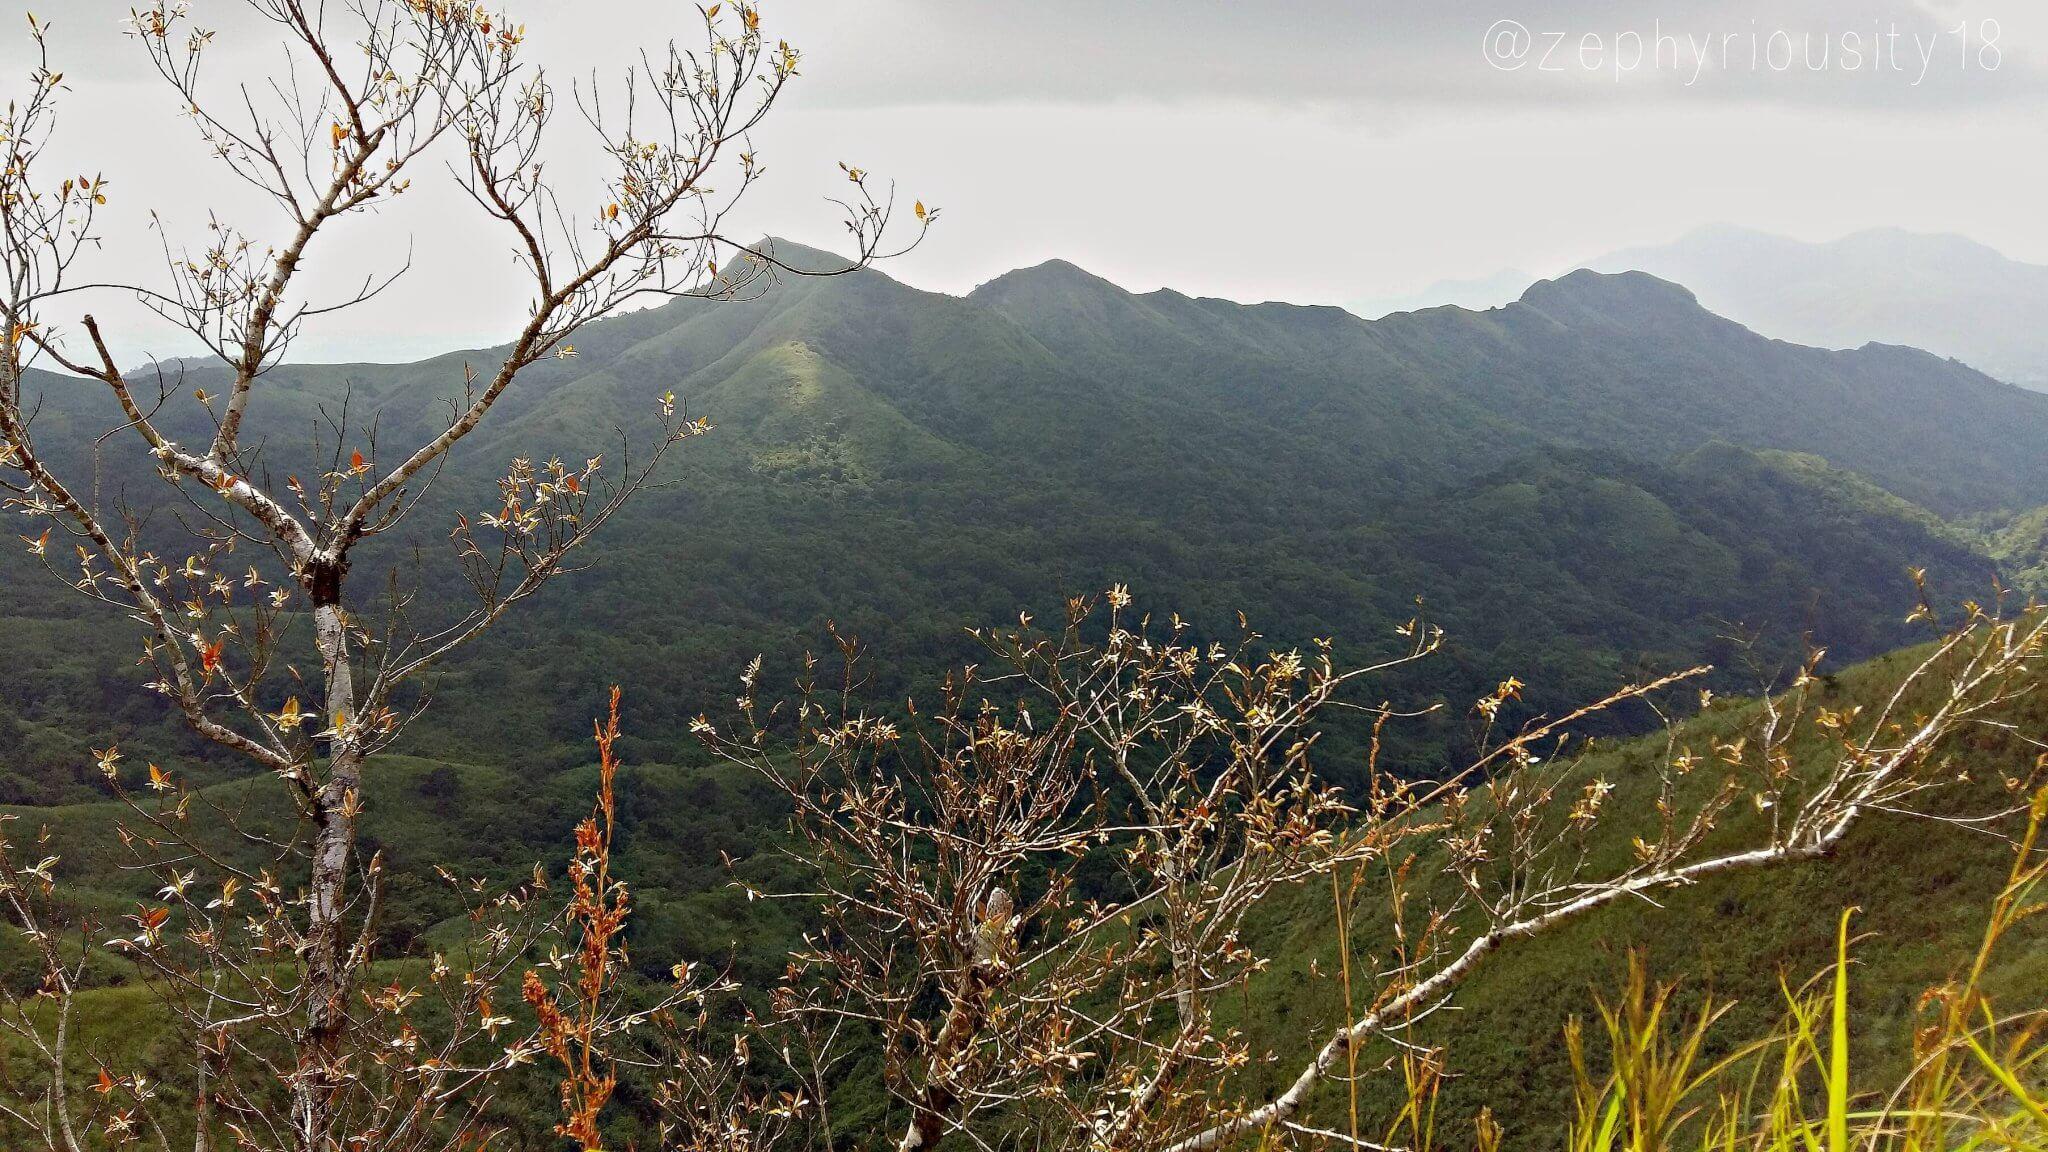 Mount Batulao at Nasugbu Batangas